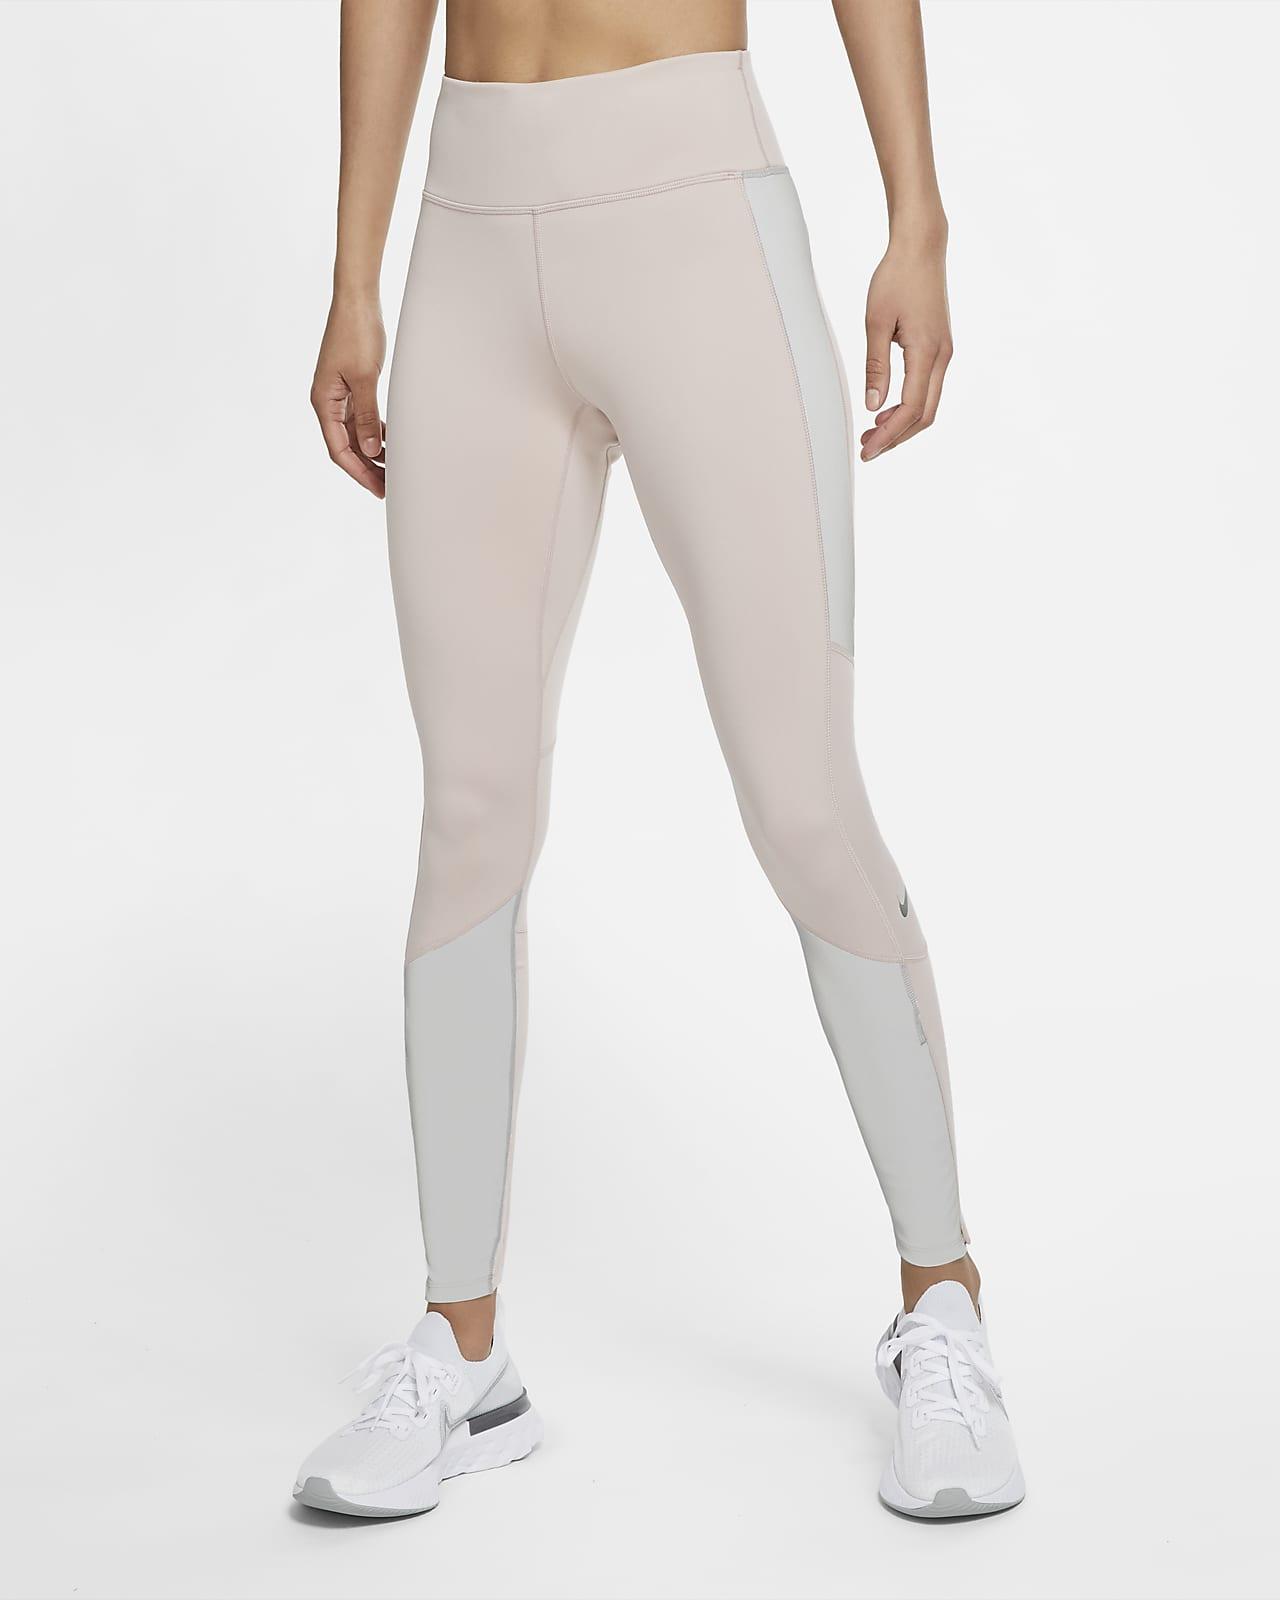 Nike Epic Luxe Run Division Flash Women's Running Leggings